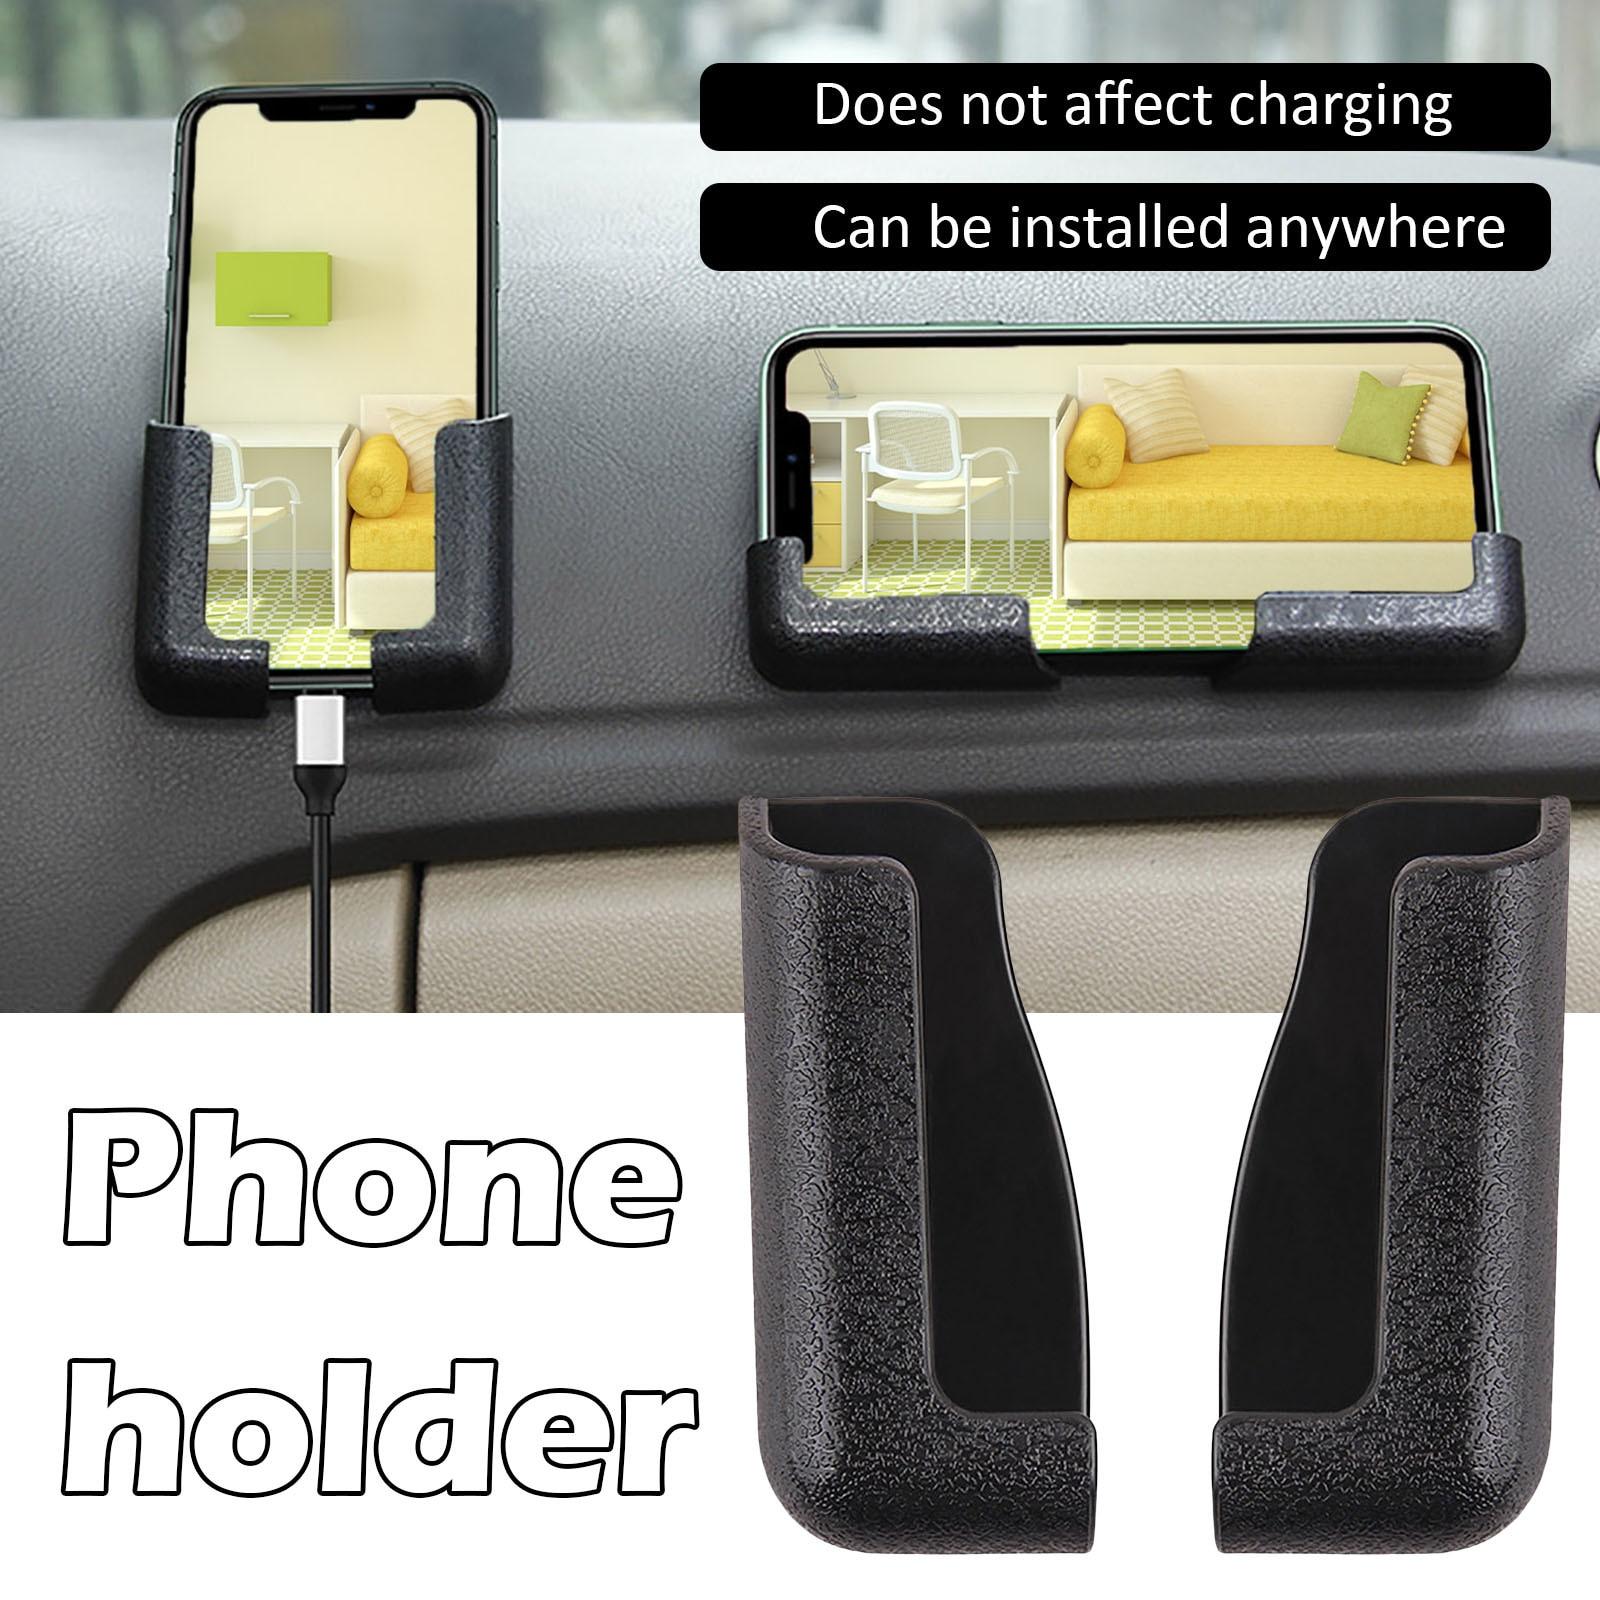 Portable Mobile phone bracket Self-adhesive Adjustable Anywhere Car Cell Phone Mount Holder Support, Navigator bracket, Reusable